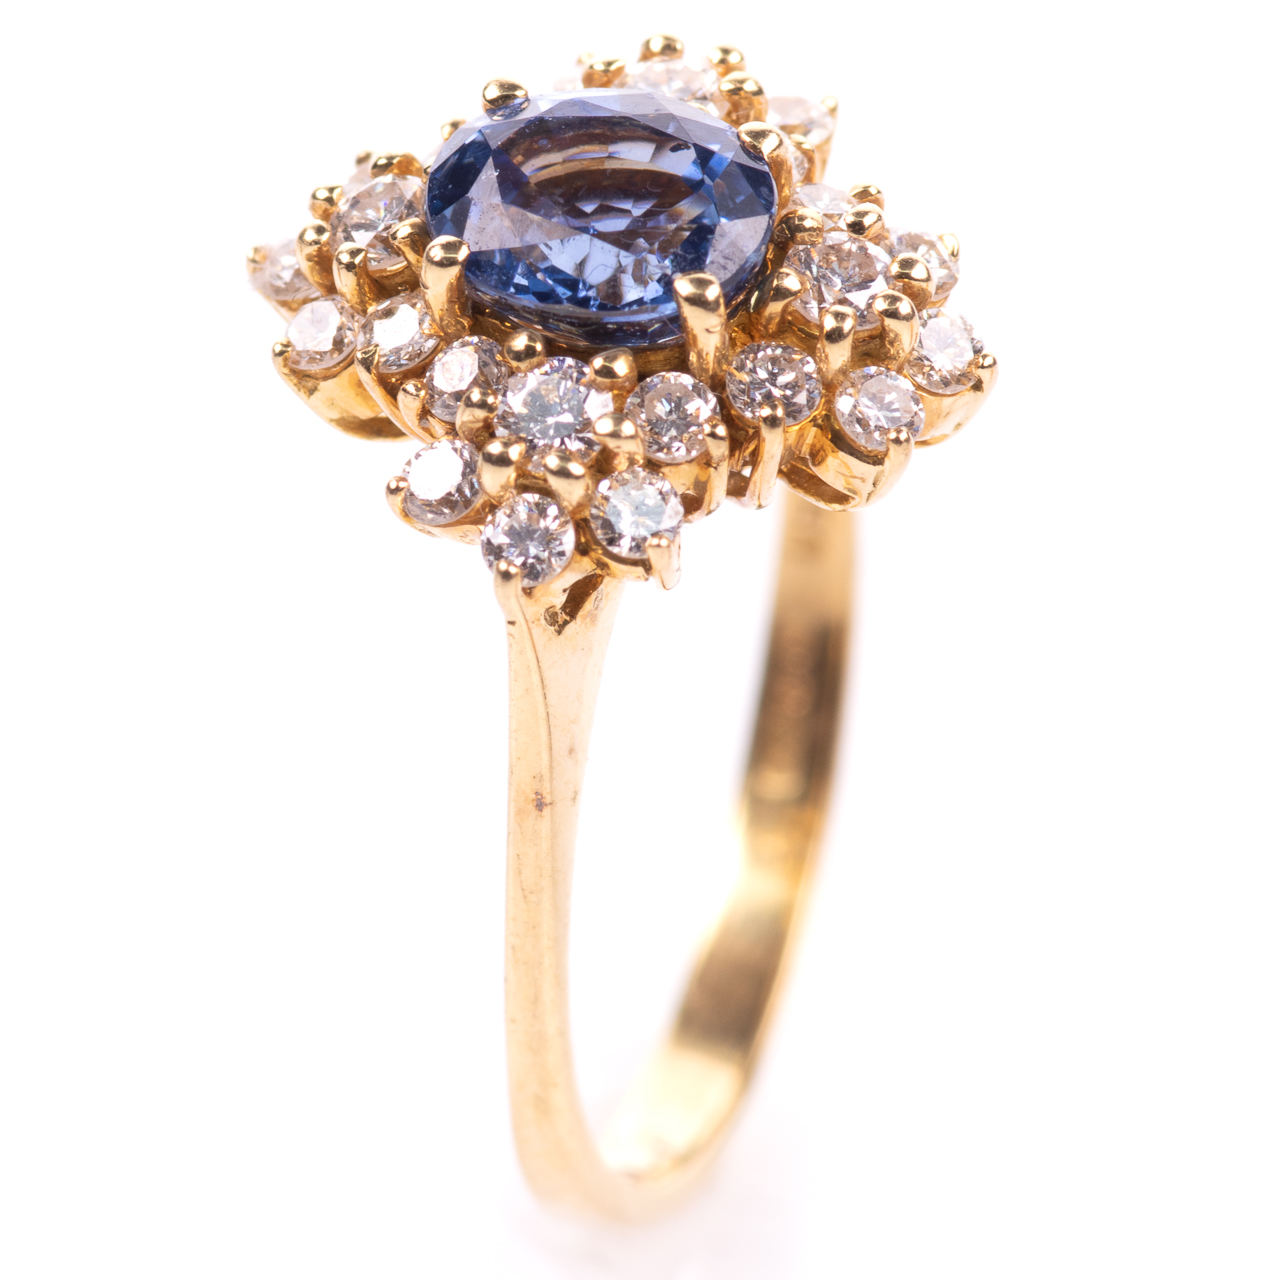 18ct Gold 1ct Sapphire & 0.70ct Diamond Ring - Image 2 of 8